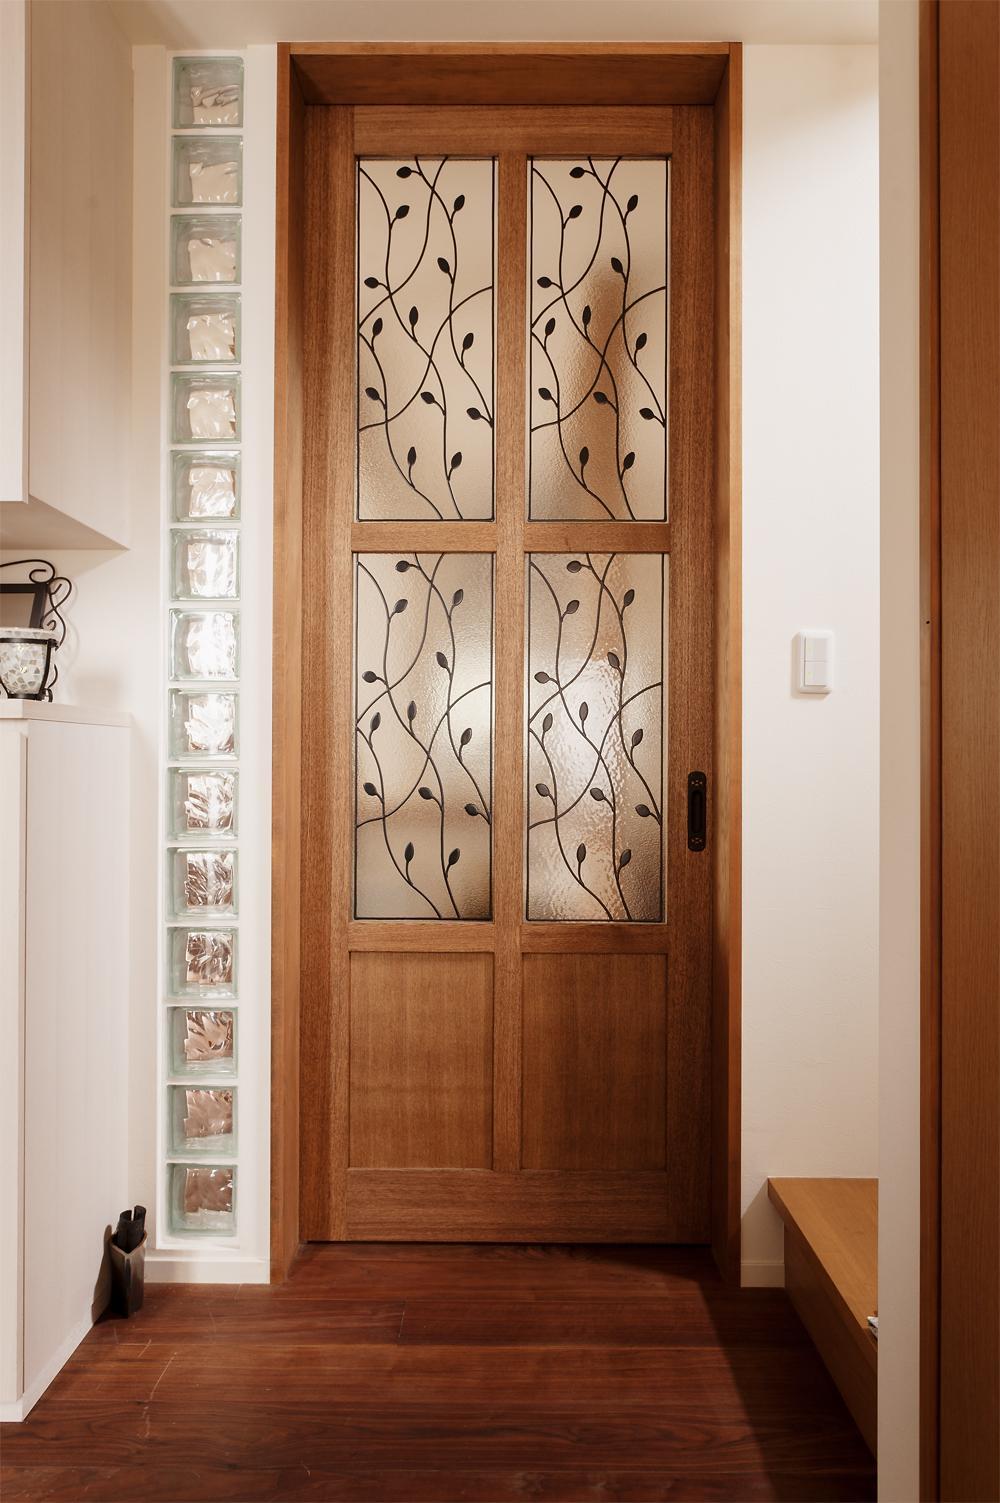 S邸・家族の笑顔がつながるオープンキッチンの部屋 オリジナルデザインのリビングドア